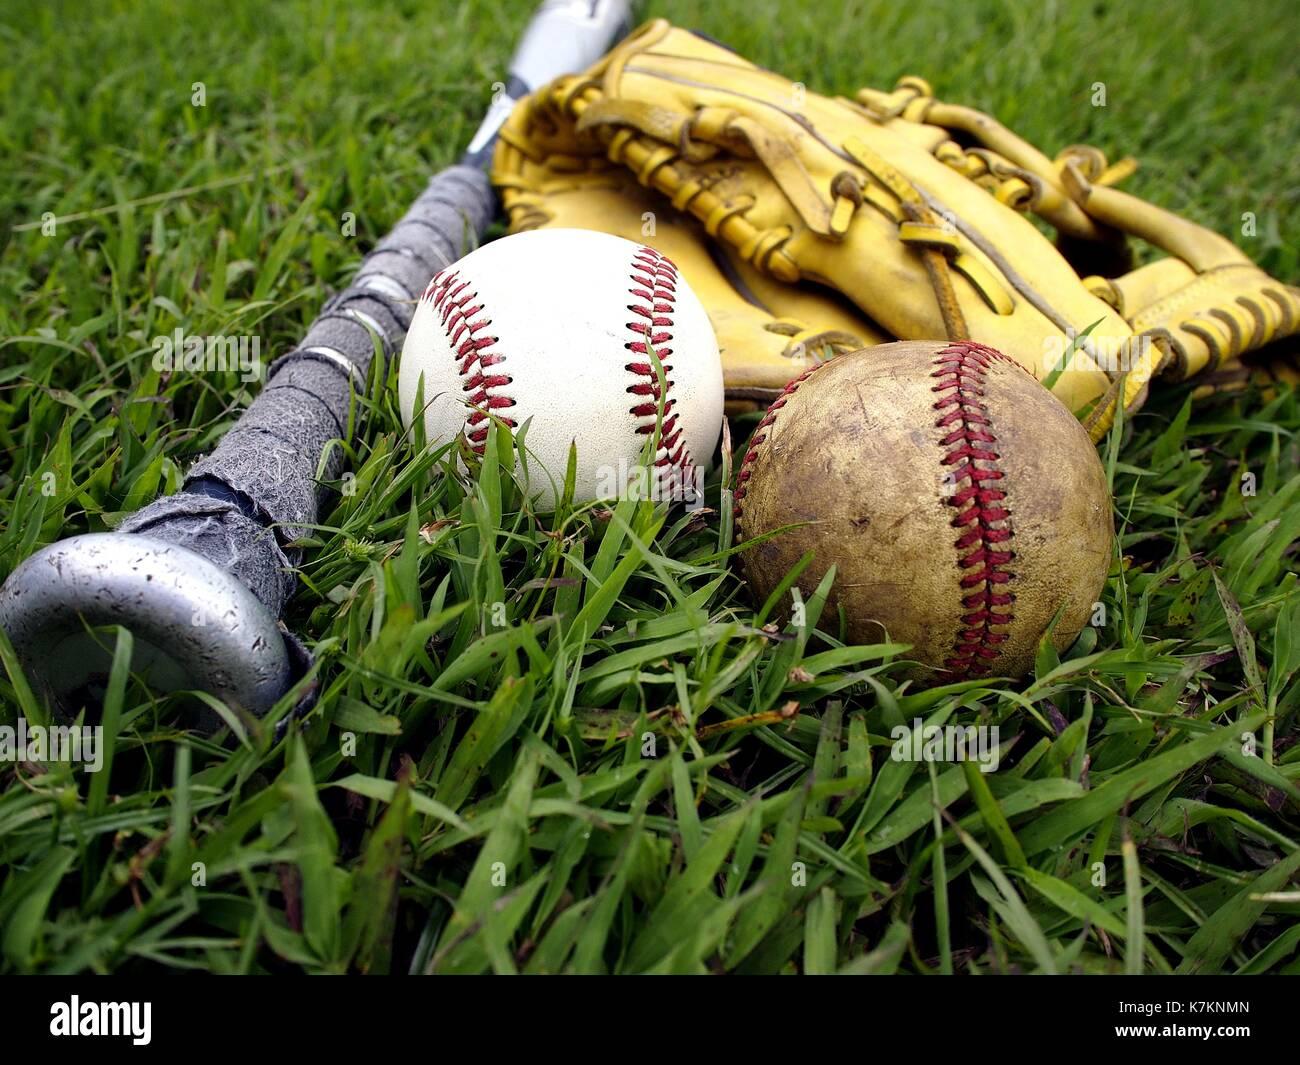 Photo of a baseball gloves, baseball and a baseball bat on the grass - Stock Image